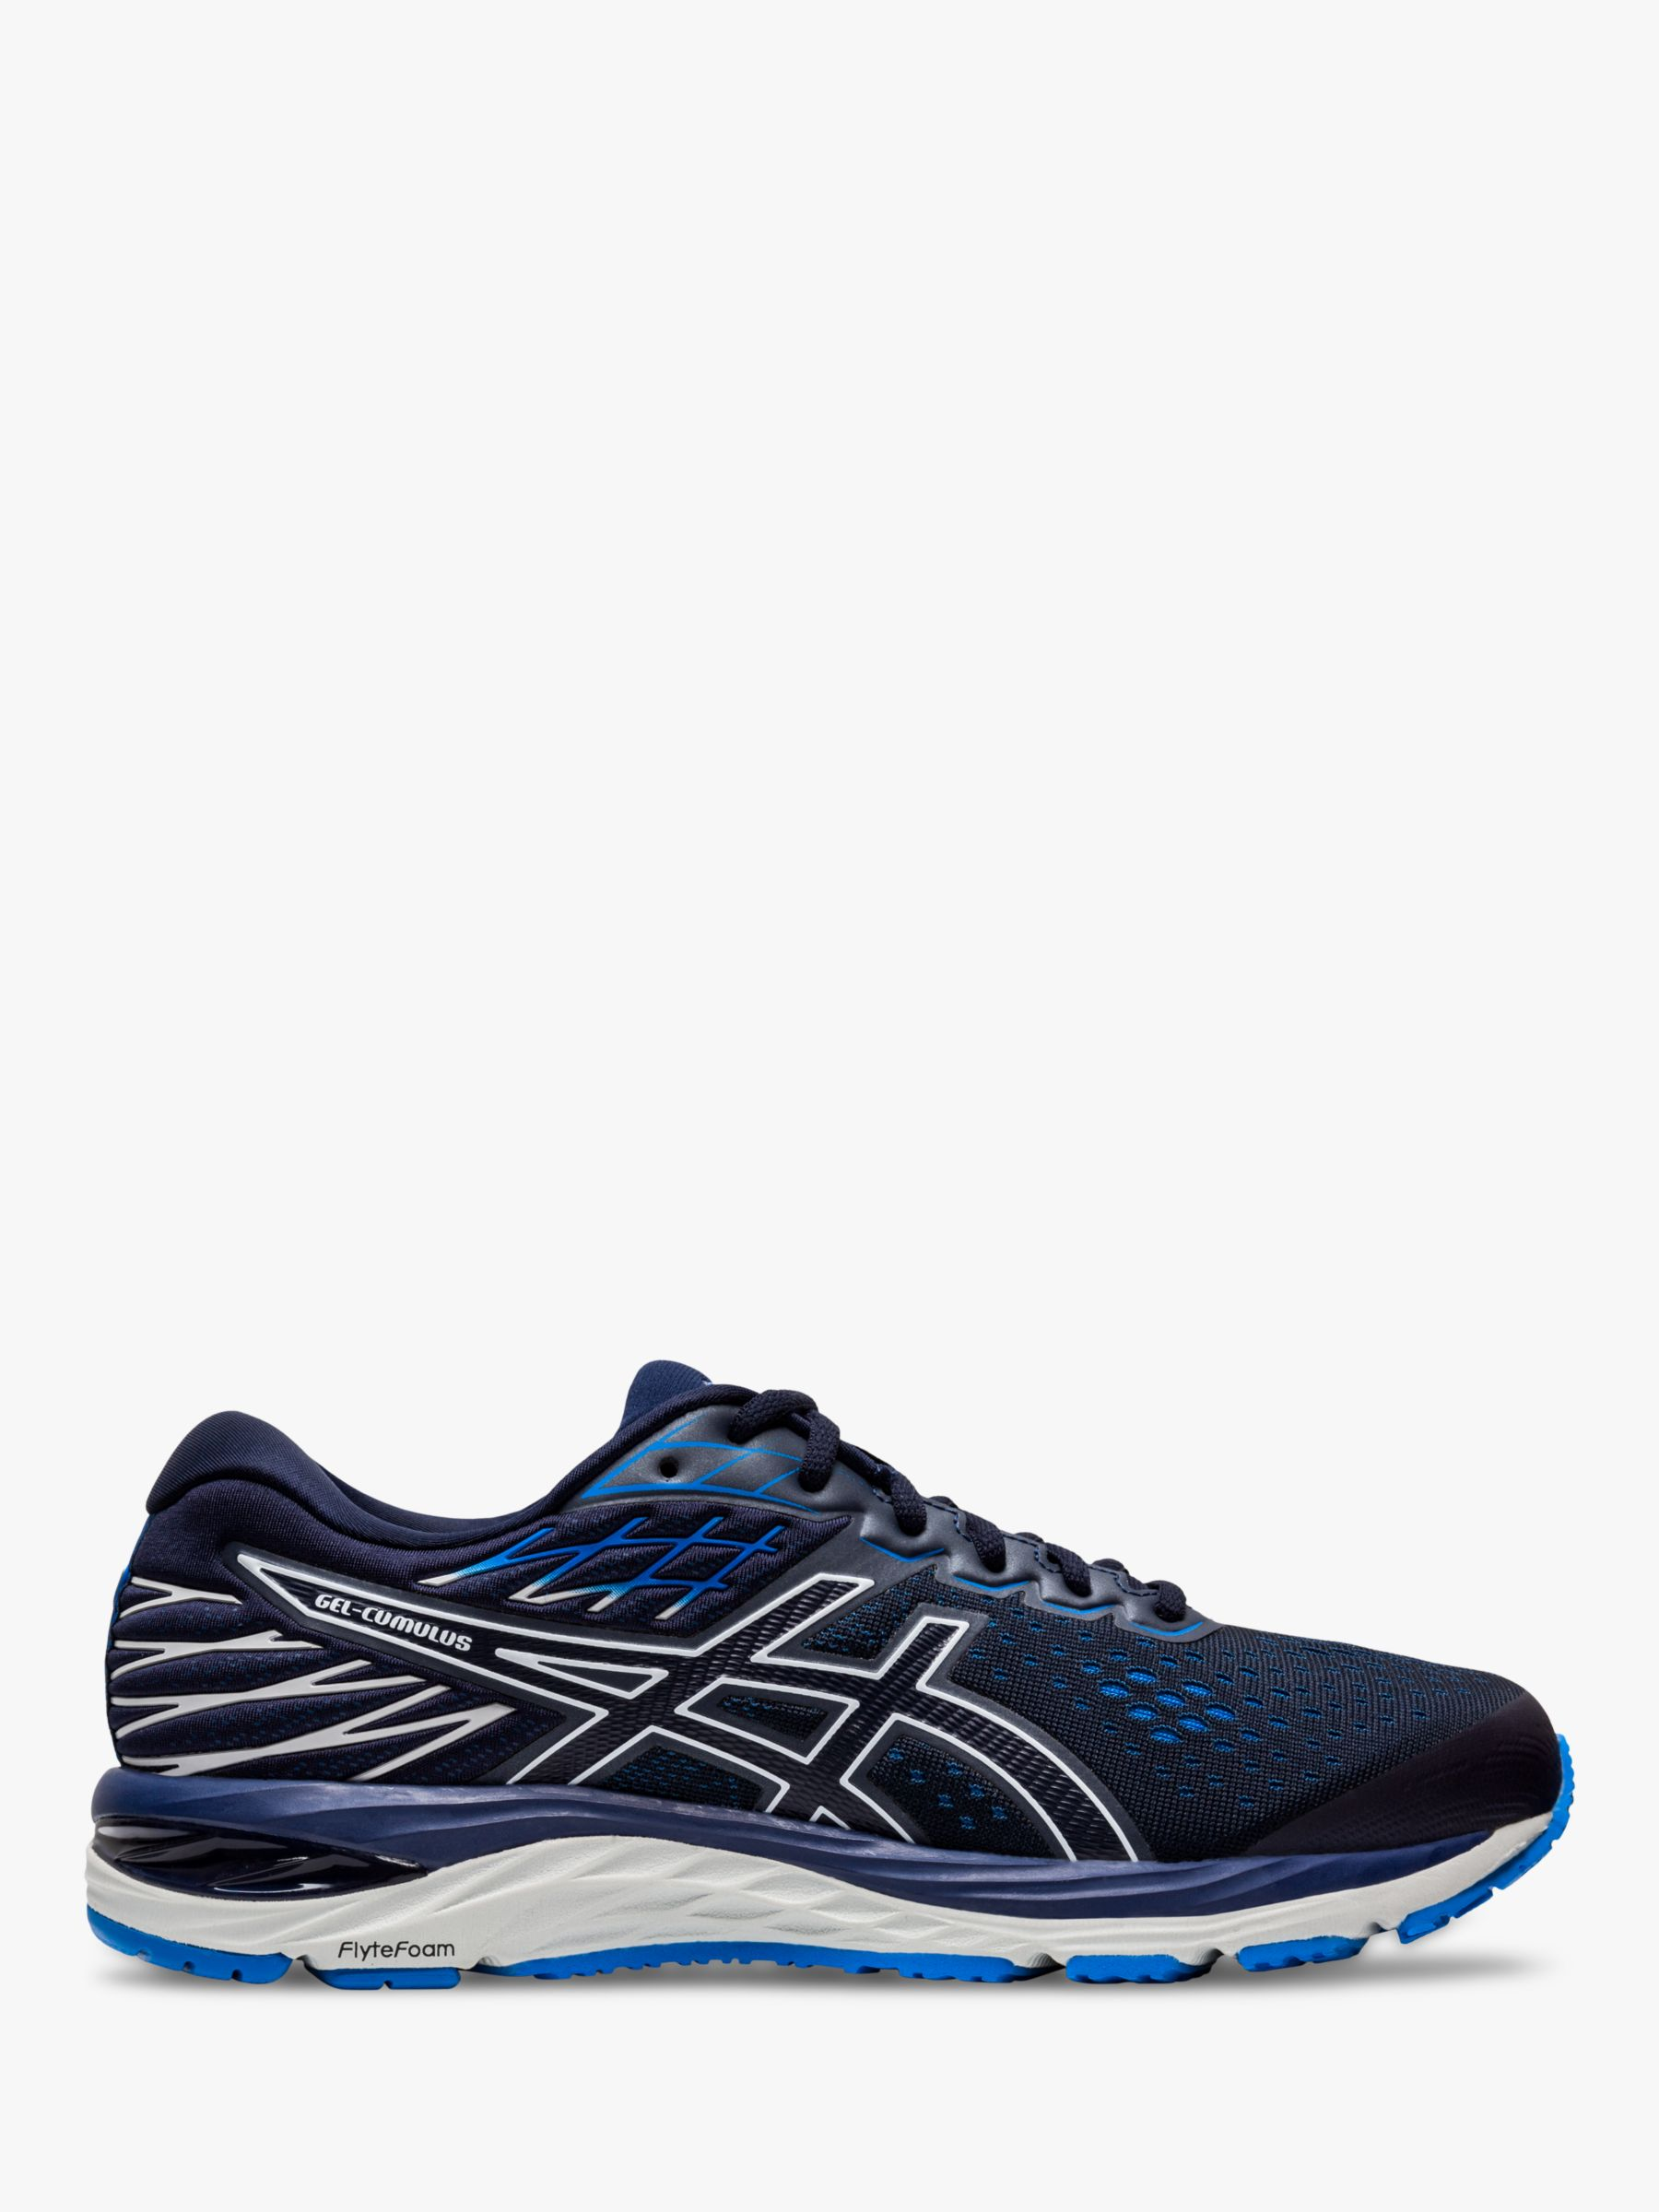 ASICS ASICS GEL-CUMULUS 21 Men's Running Shoes, Midnight Blue